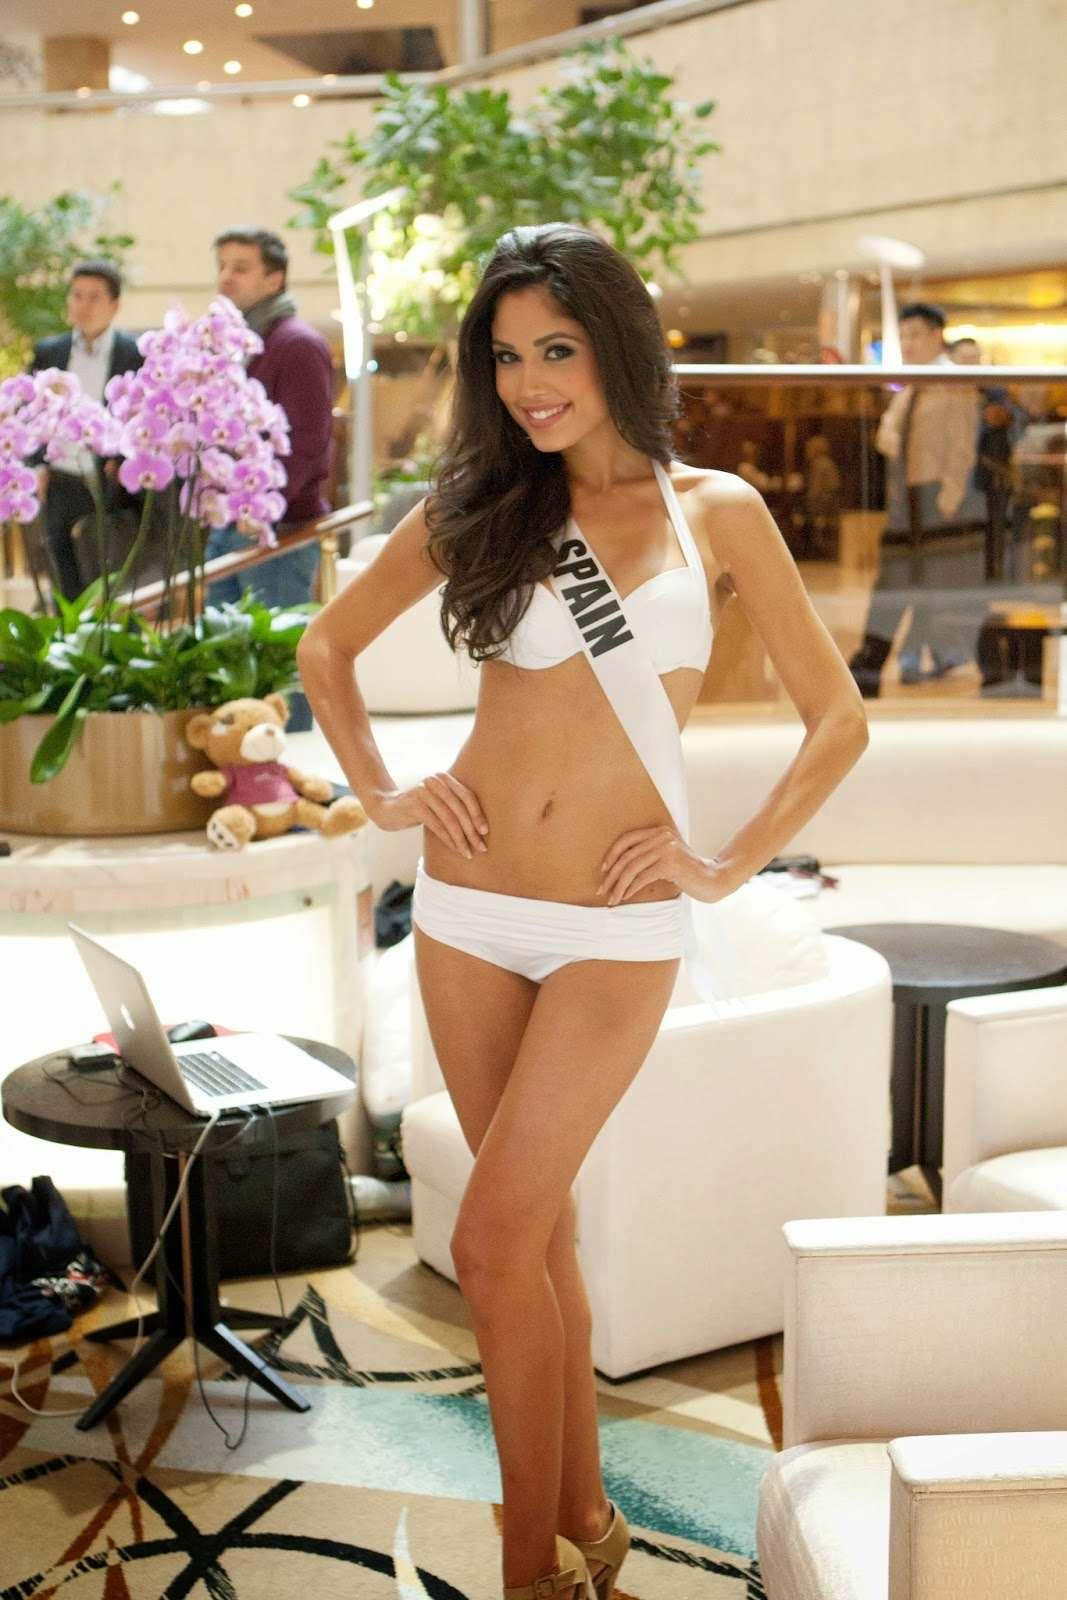 patricia yurena rodriguez, miss espana 2008/2013, 1st runner-up de miss universe 2013. - Página 5 Uni20113